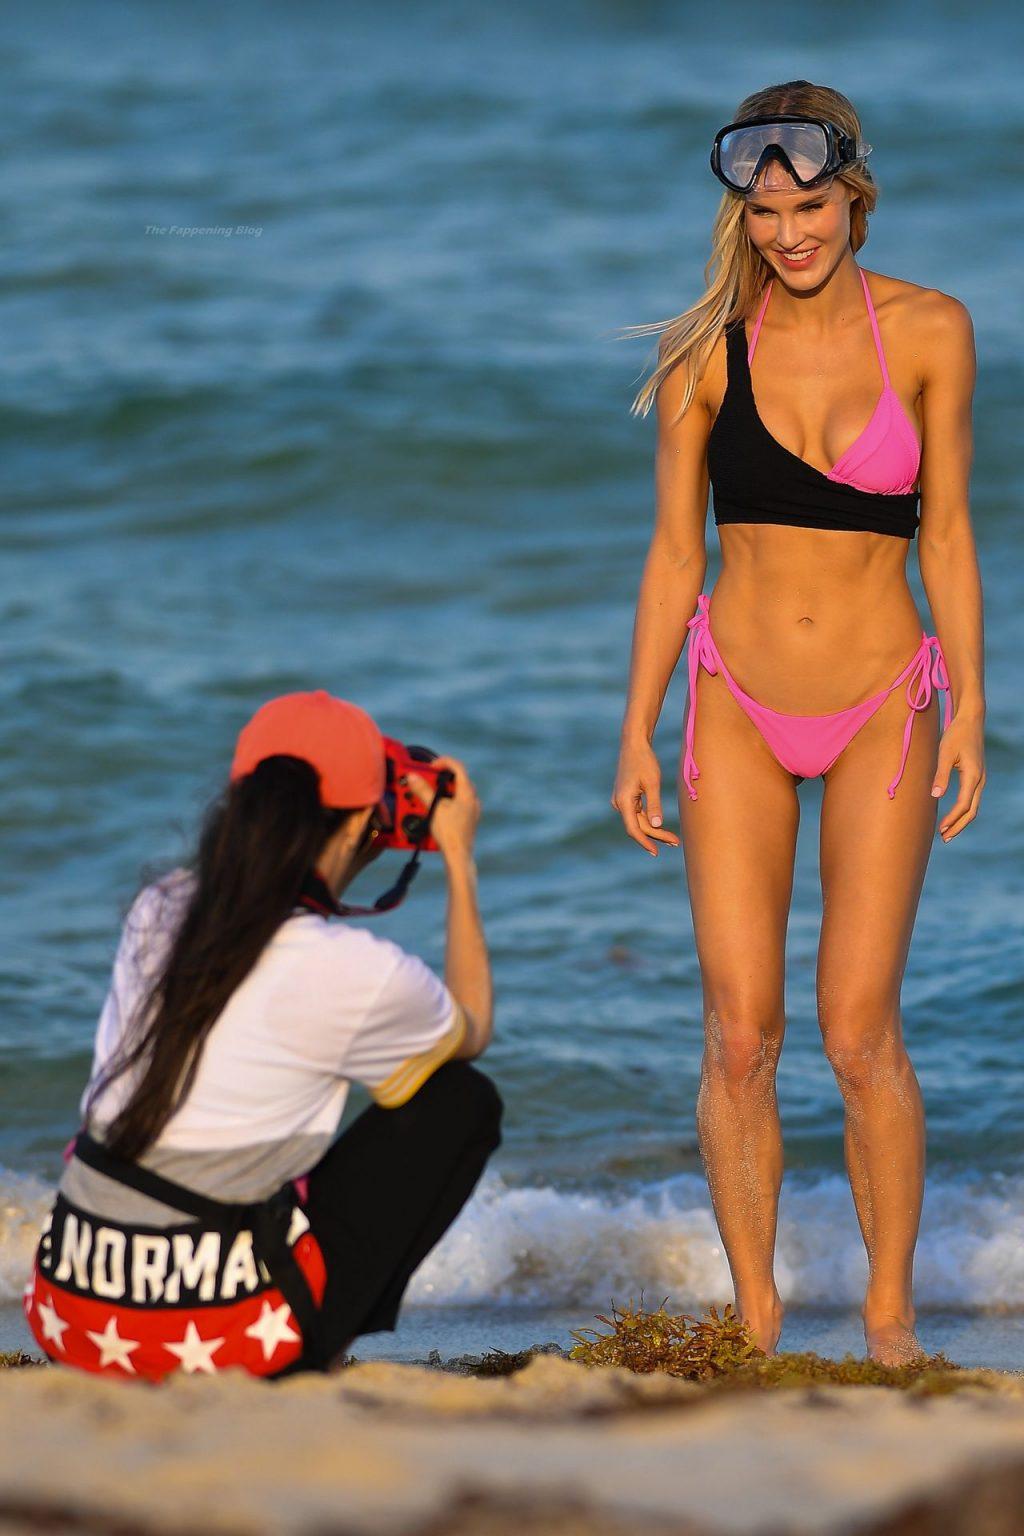 Joy Corrigan Wears a Snorkel Mask During a Shoot in Miami Beach (35 Photos)